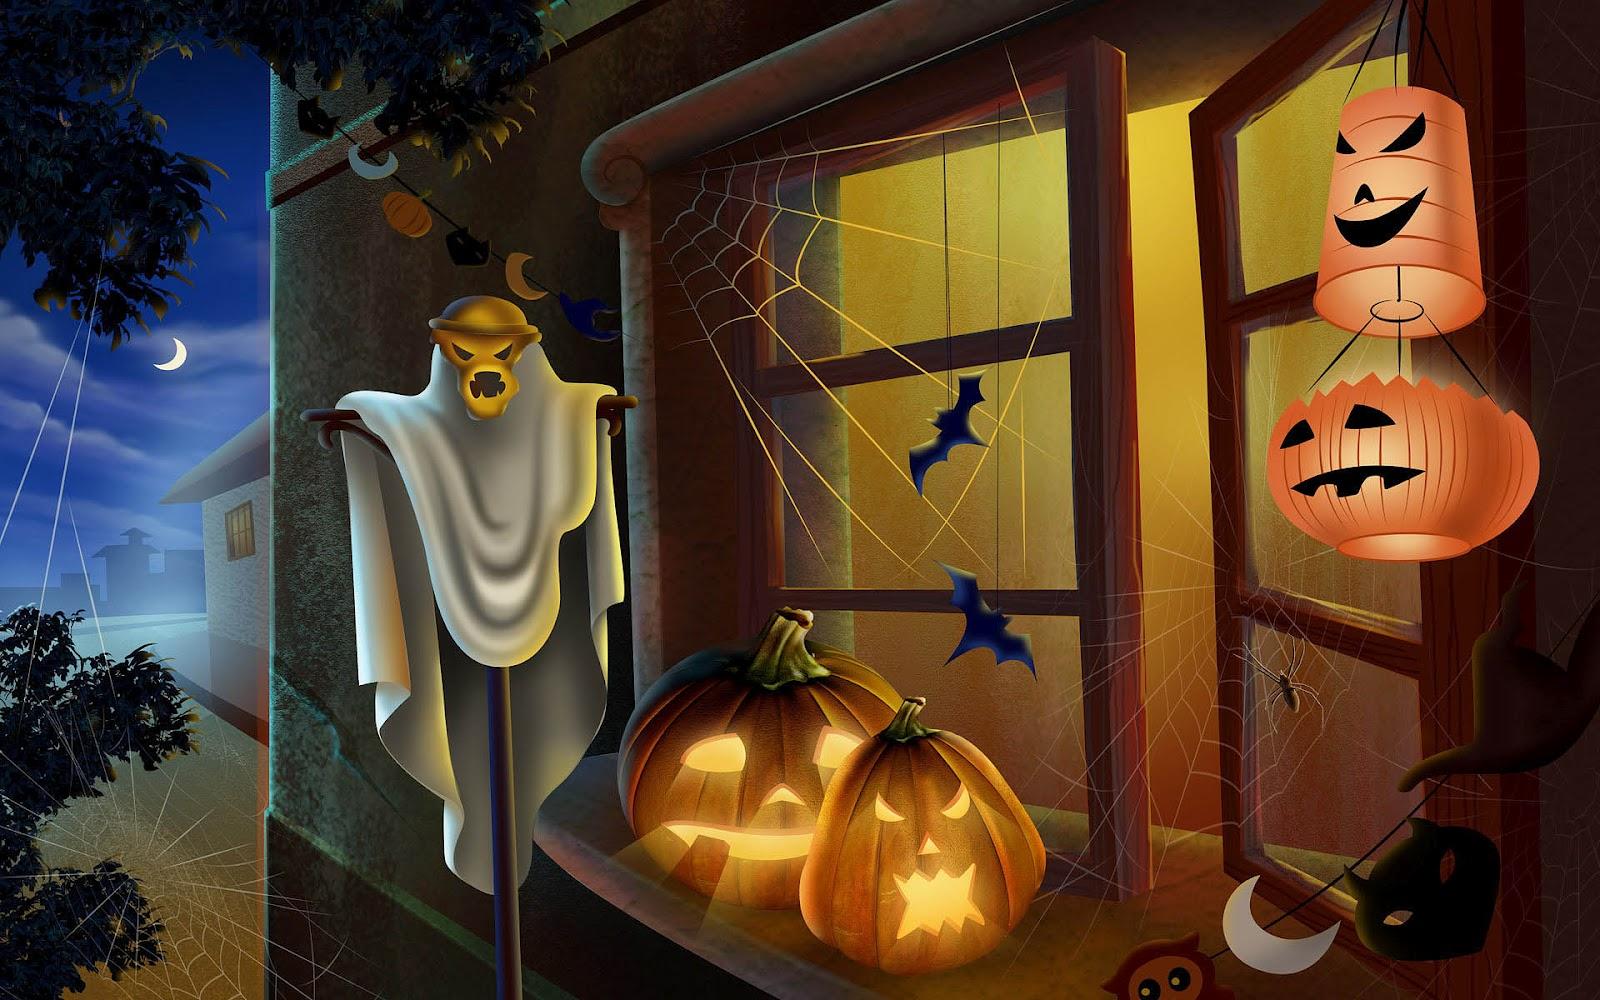 http://4.bp.blogspot.com/-d9QIxZIVm9o/UF8WT4zlO9I/AAAAAAAADeg/iTiPPVHm79Y/s1600/hd-3d-halloween-achtergrond-met-veel-pompoenen-hd-3d-halloween-wallpaper.jpg